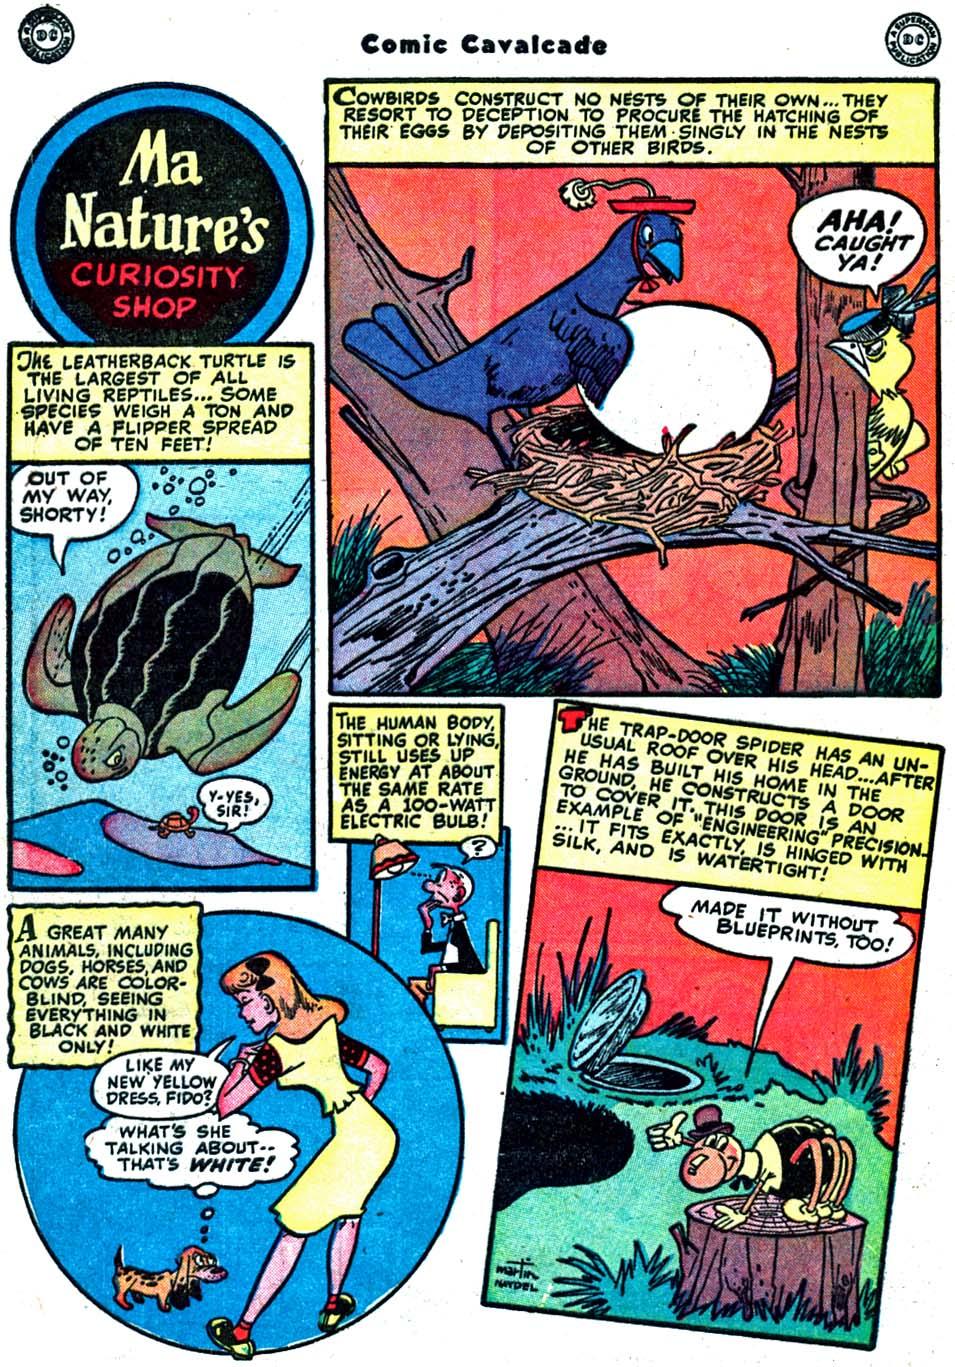 Comic Cavalcade issue 32 - Page 48